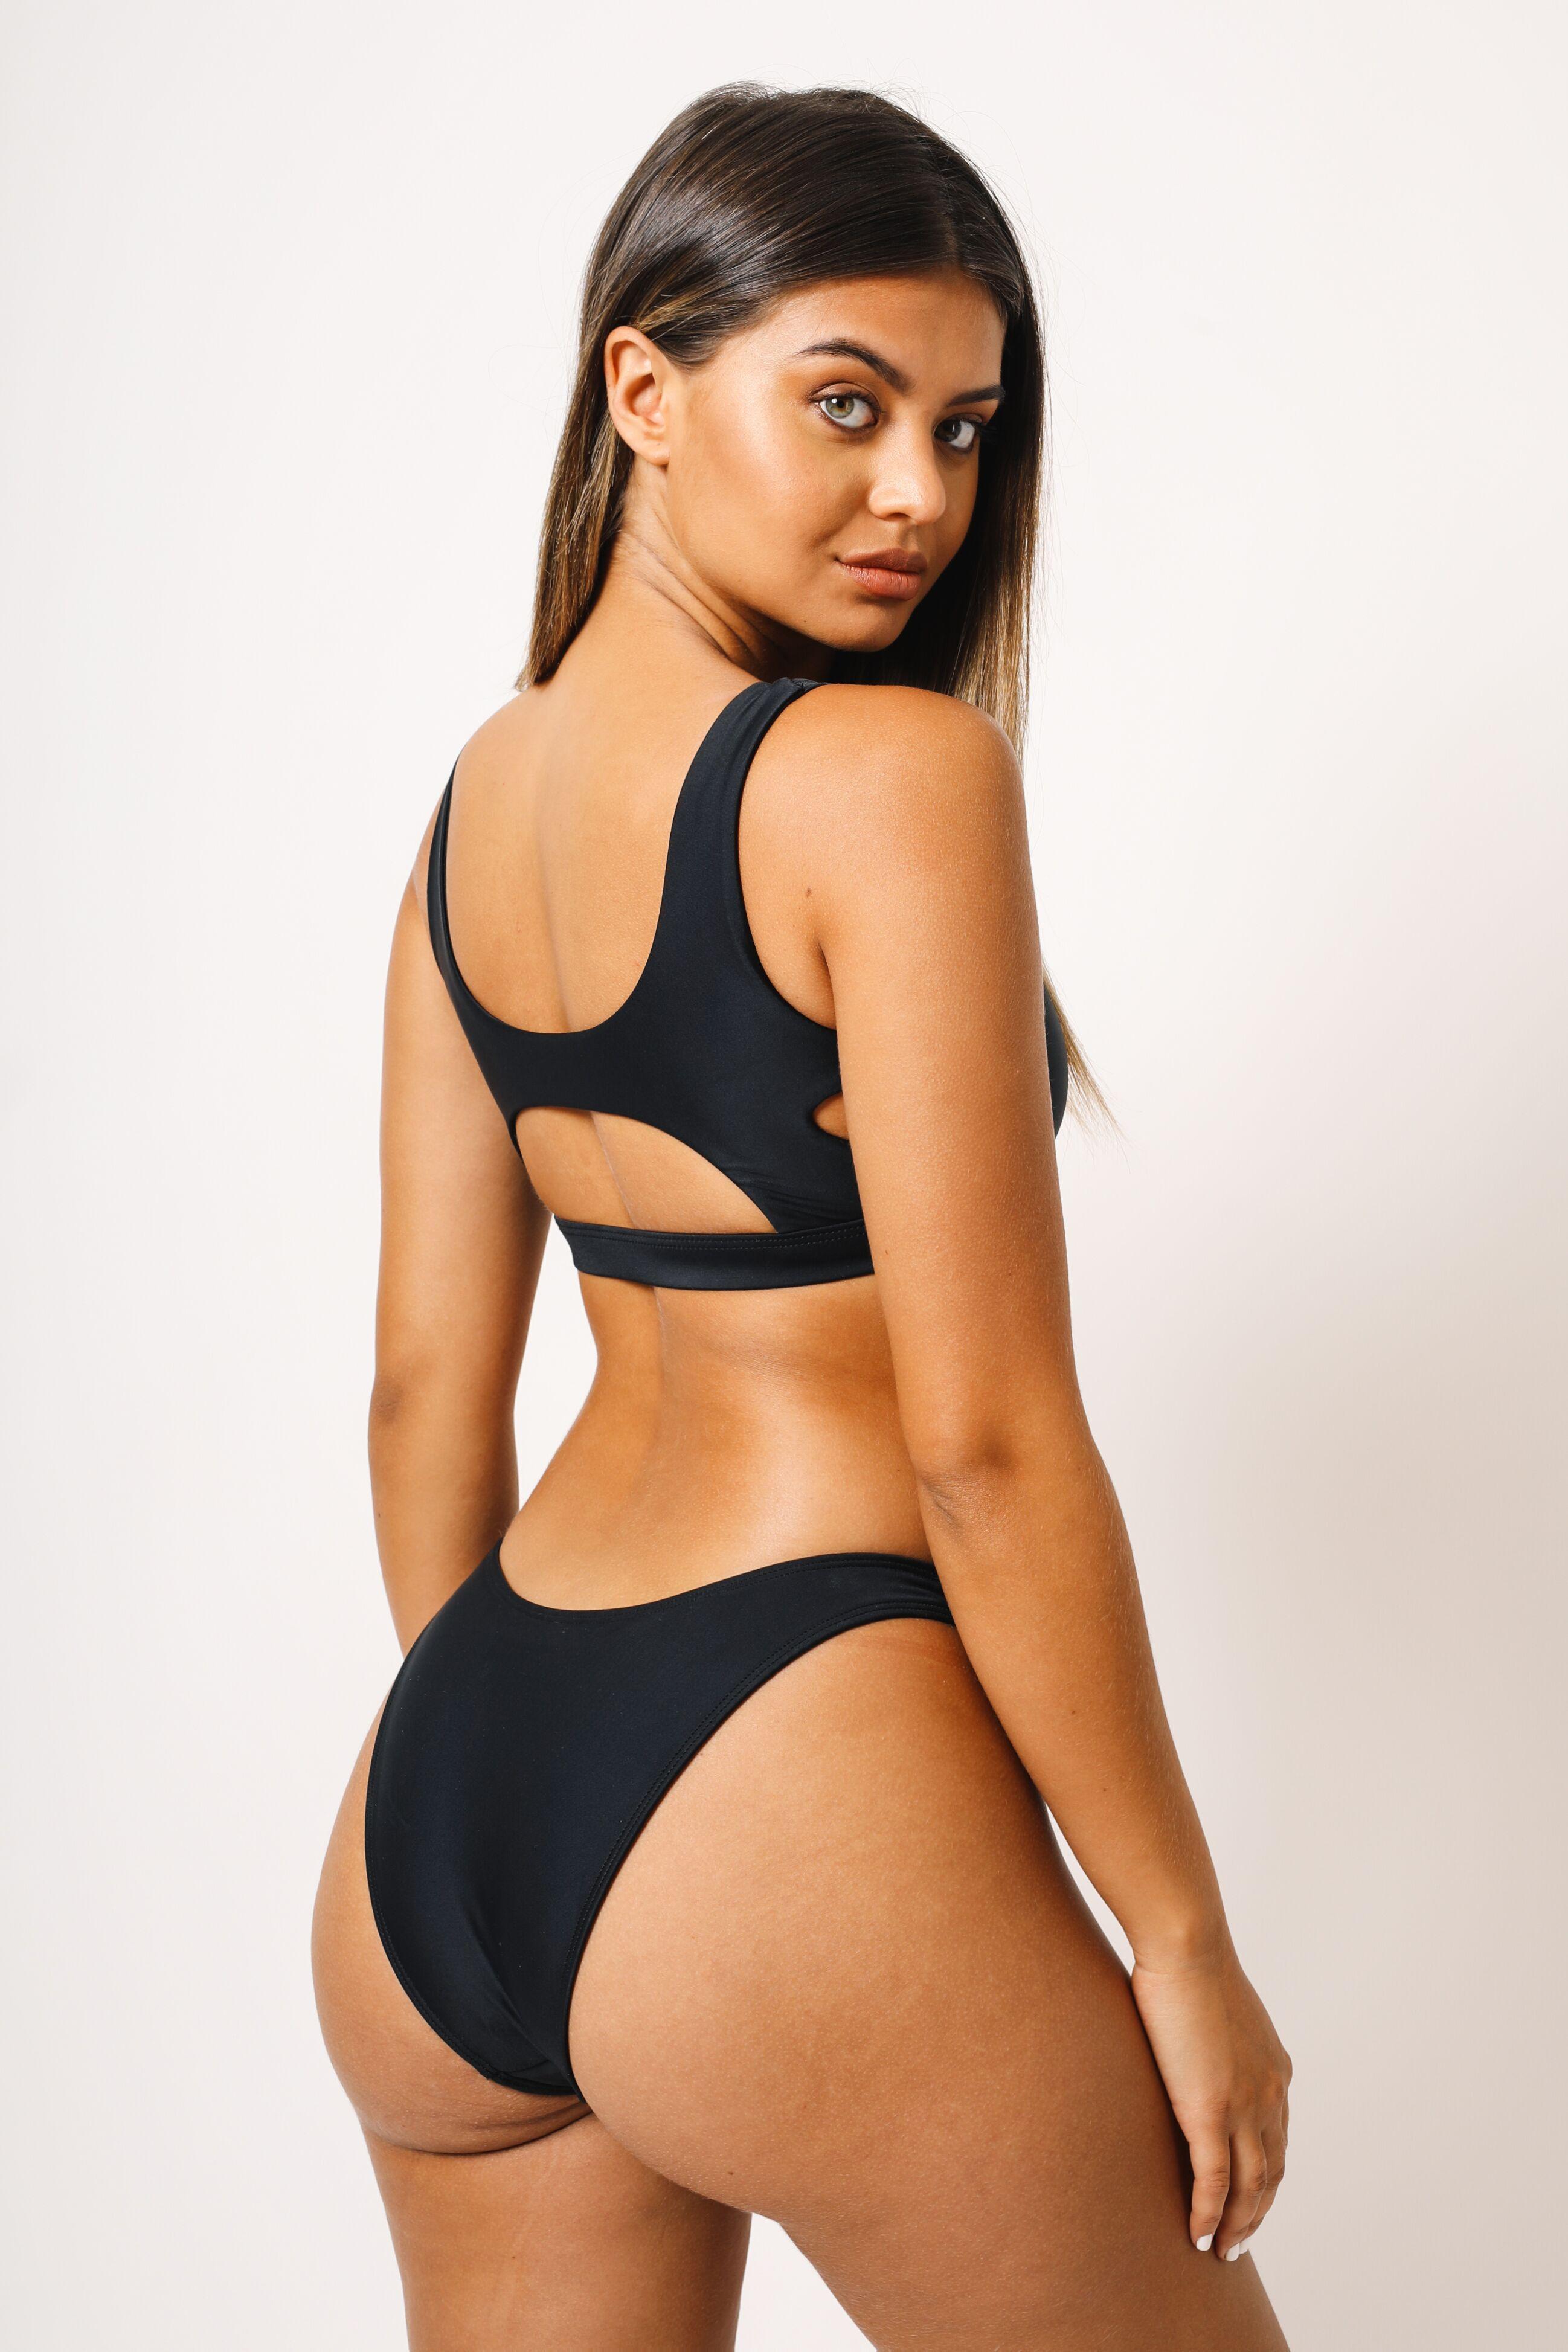 swimwear kaohs swimwear ishine365 shop ishine365 black bikini bottom full coverage bikini bottom seamless bikini bottom